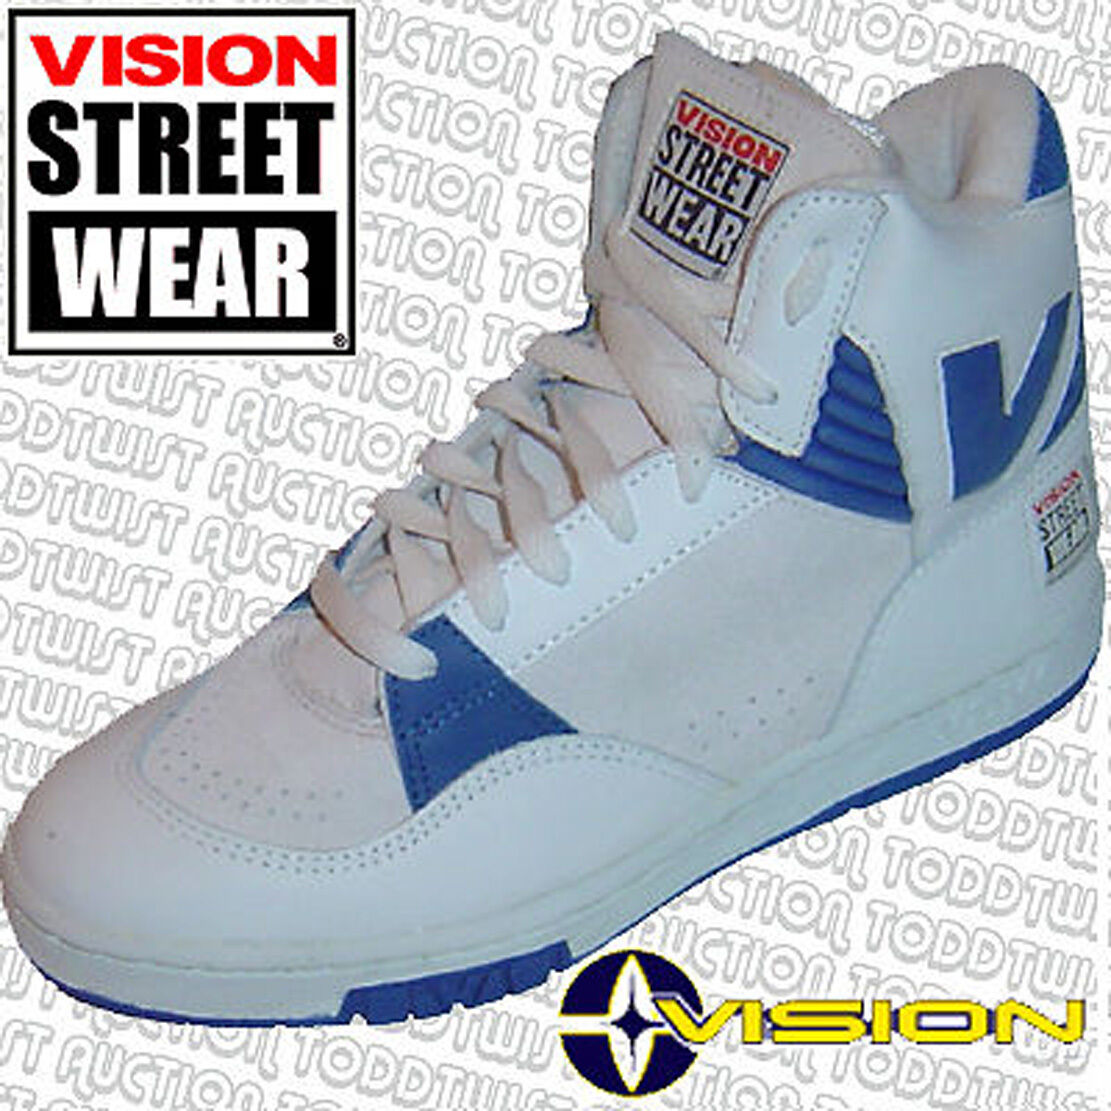 Vision Street Wear Ms15000 Skateboard Schuhe Weiß Bl - 4 UK 5 USA - Original    | Merkwürdige Form